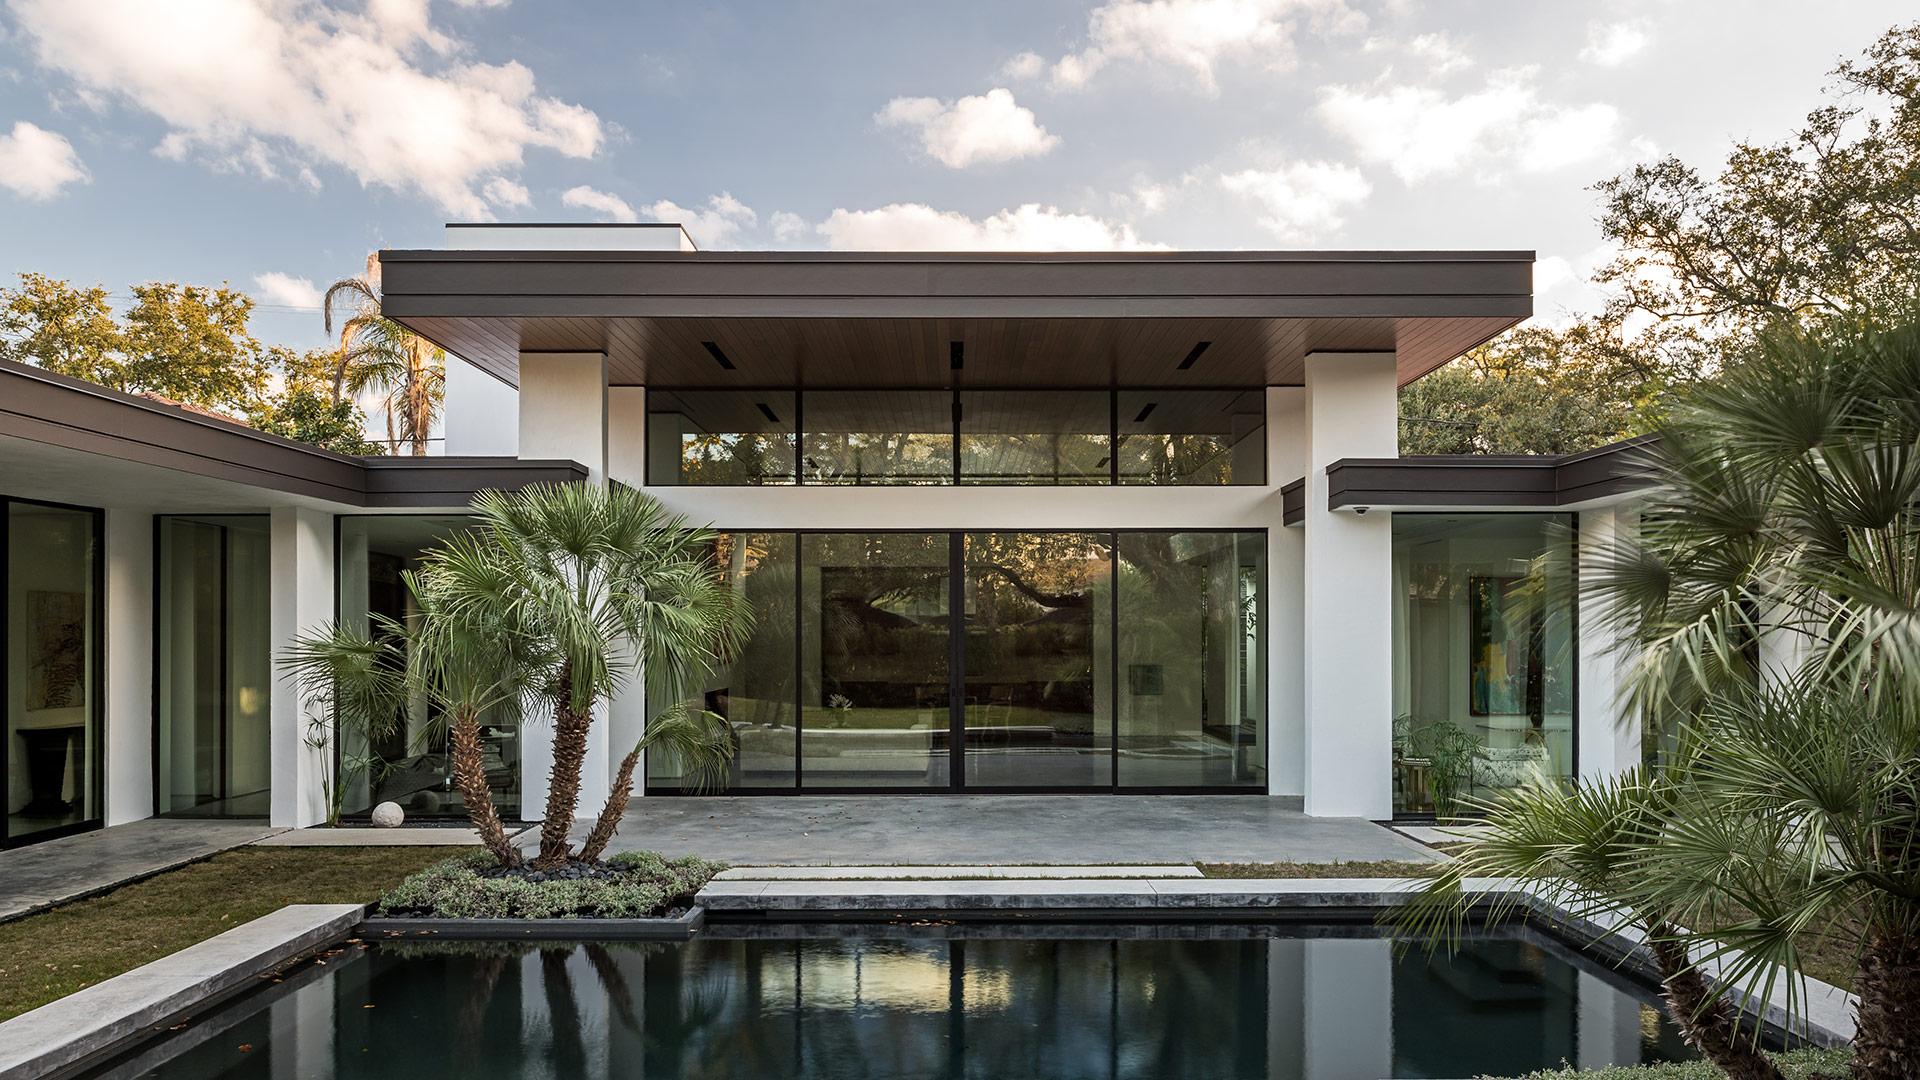 dahlstrand architecture | houston architect | residential design